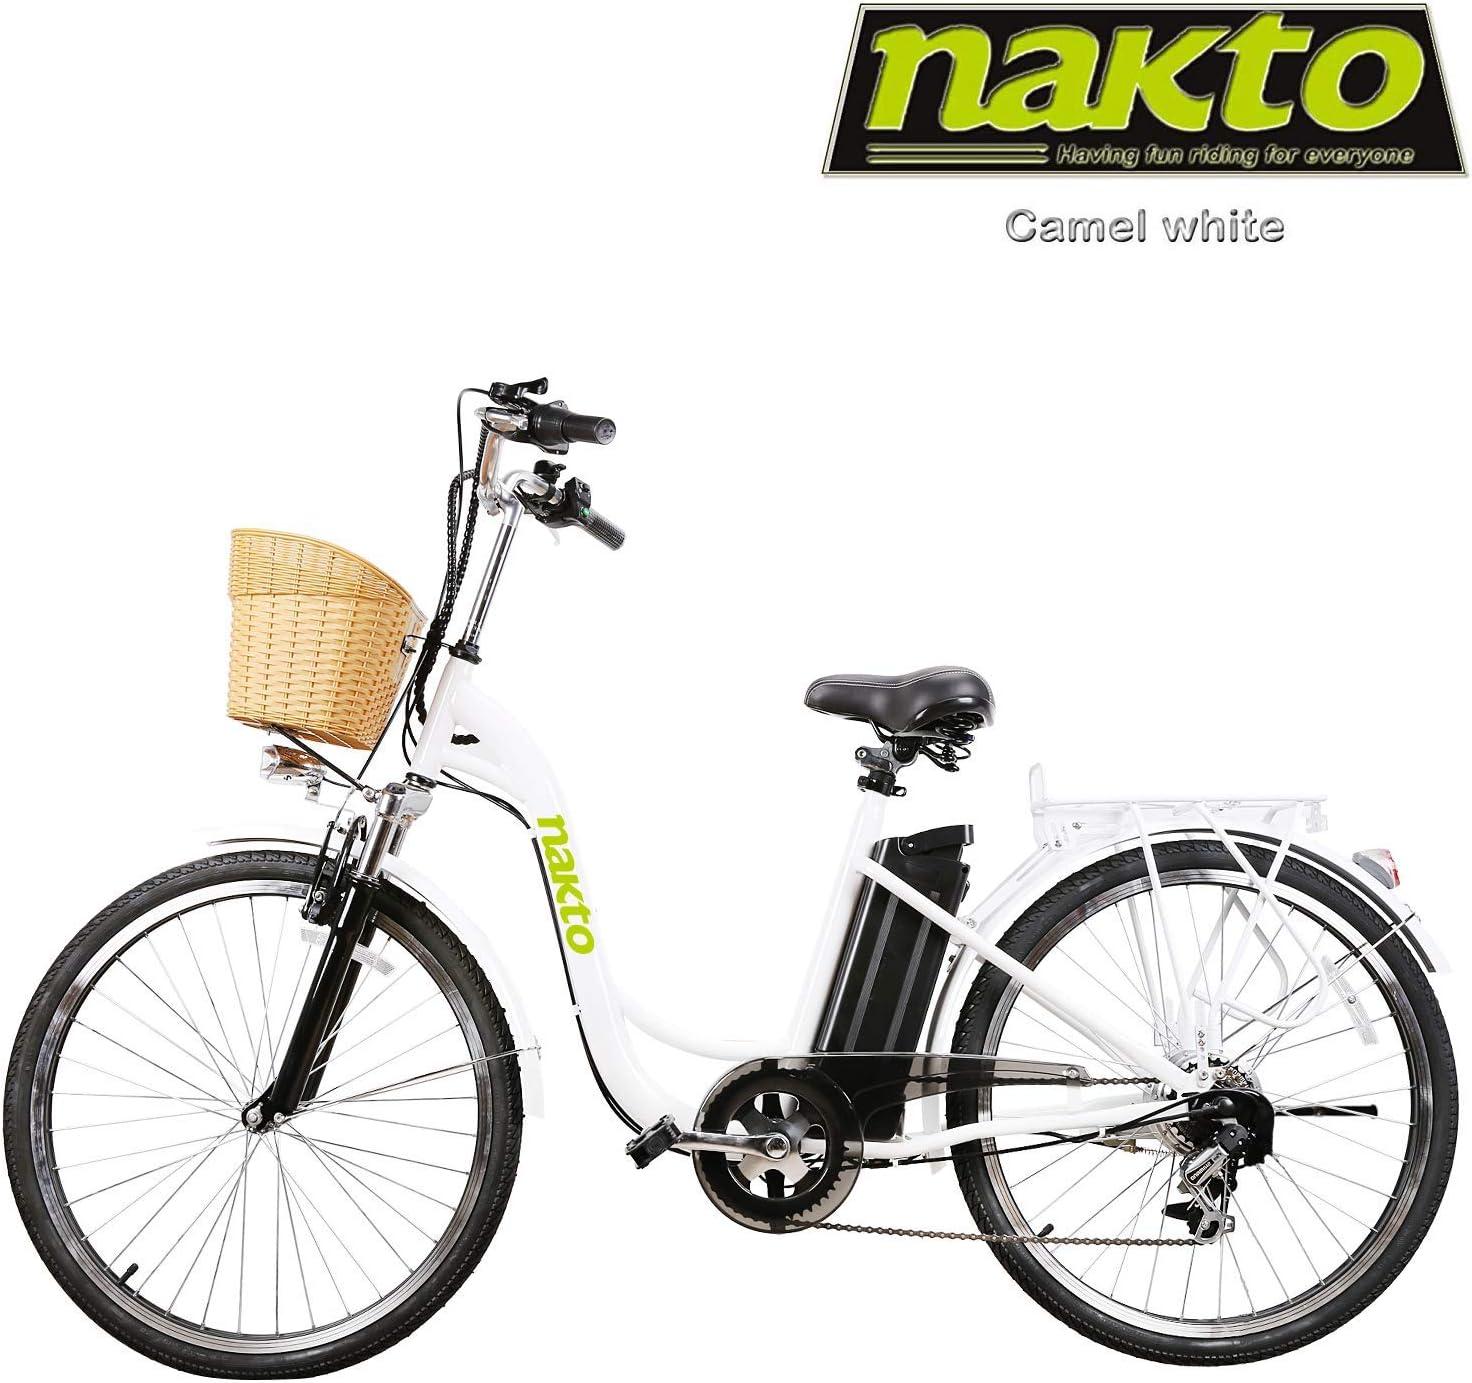 NAKTO 250W Cargo Electric Bicycle